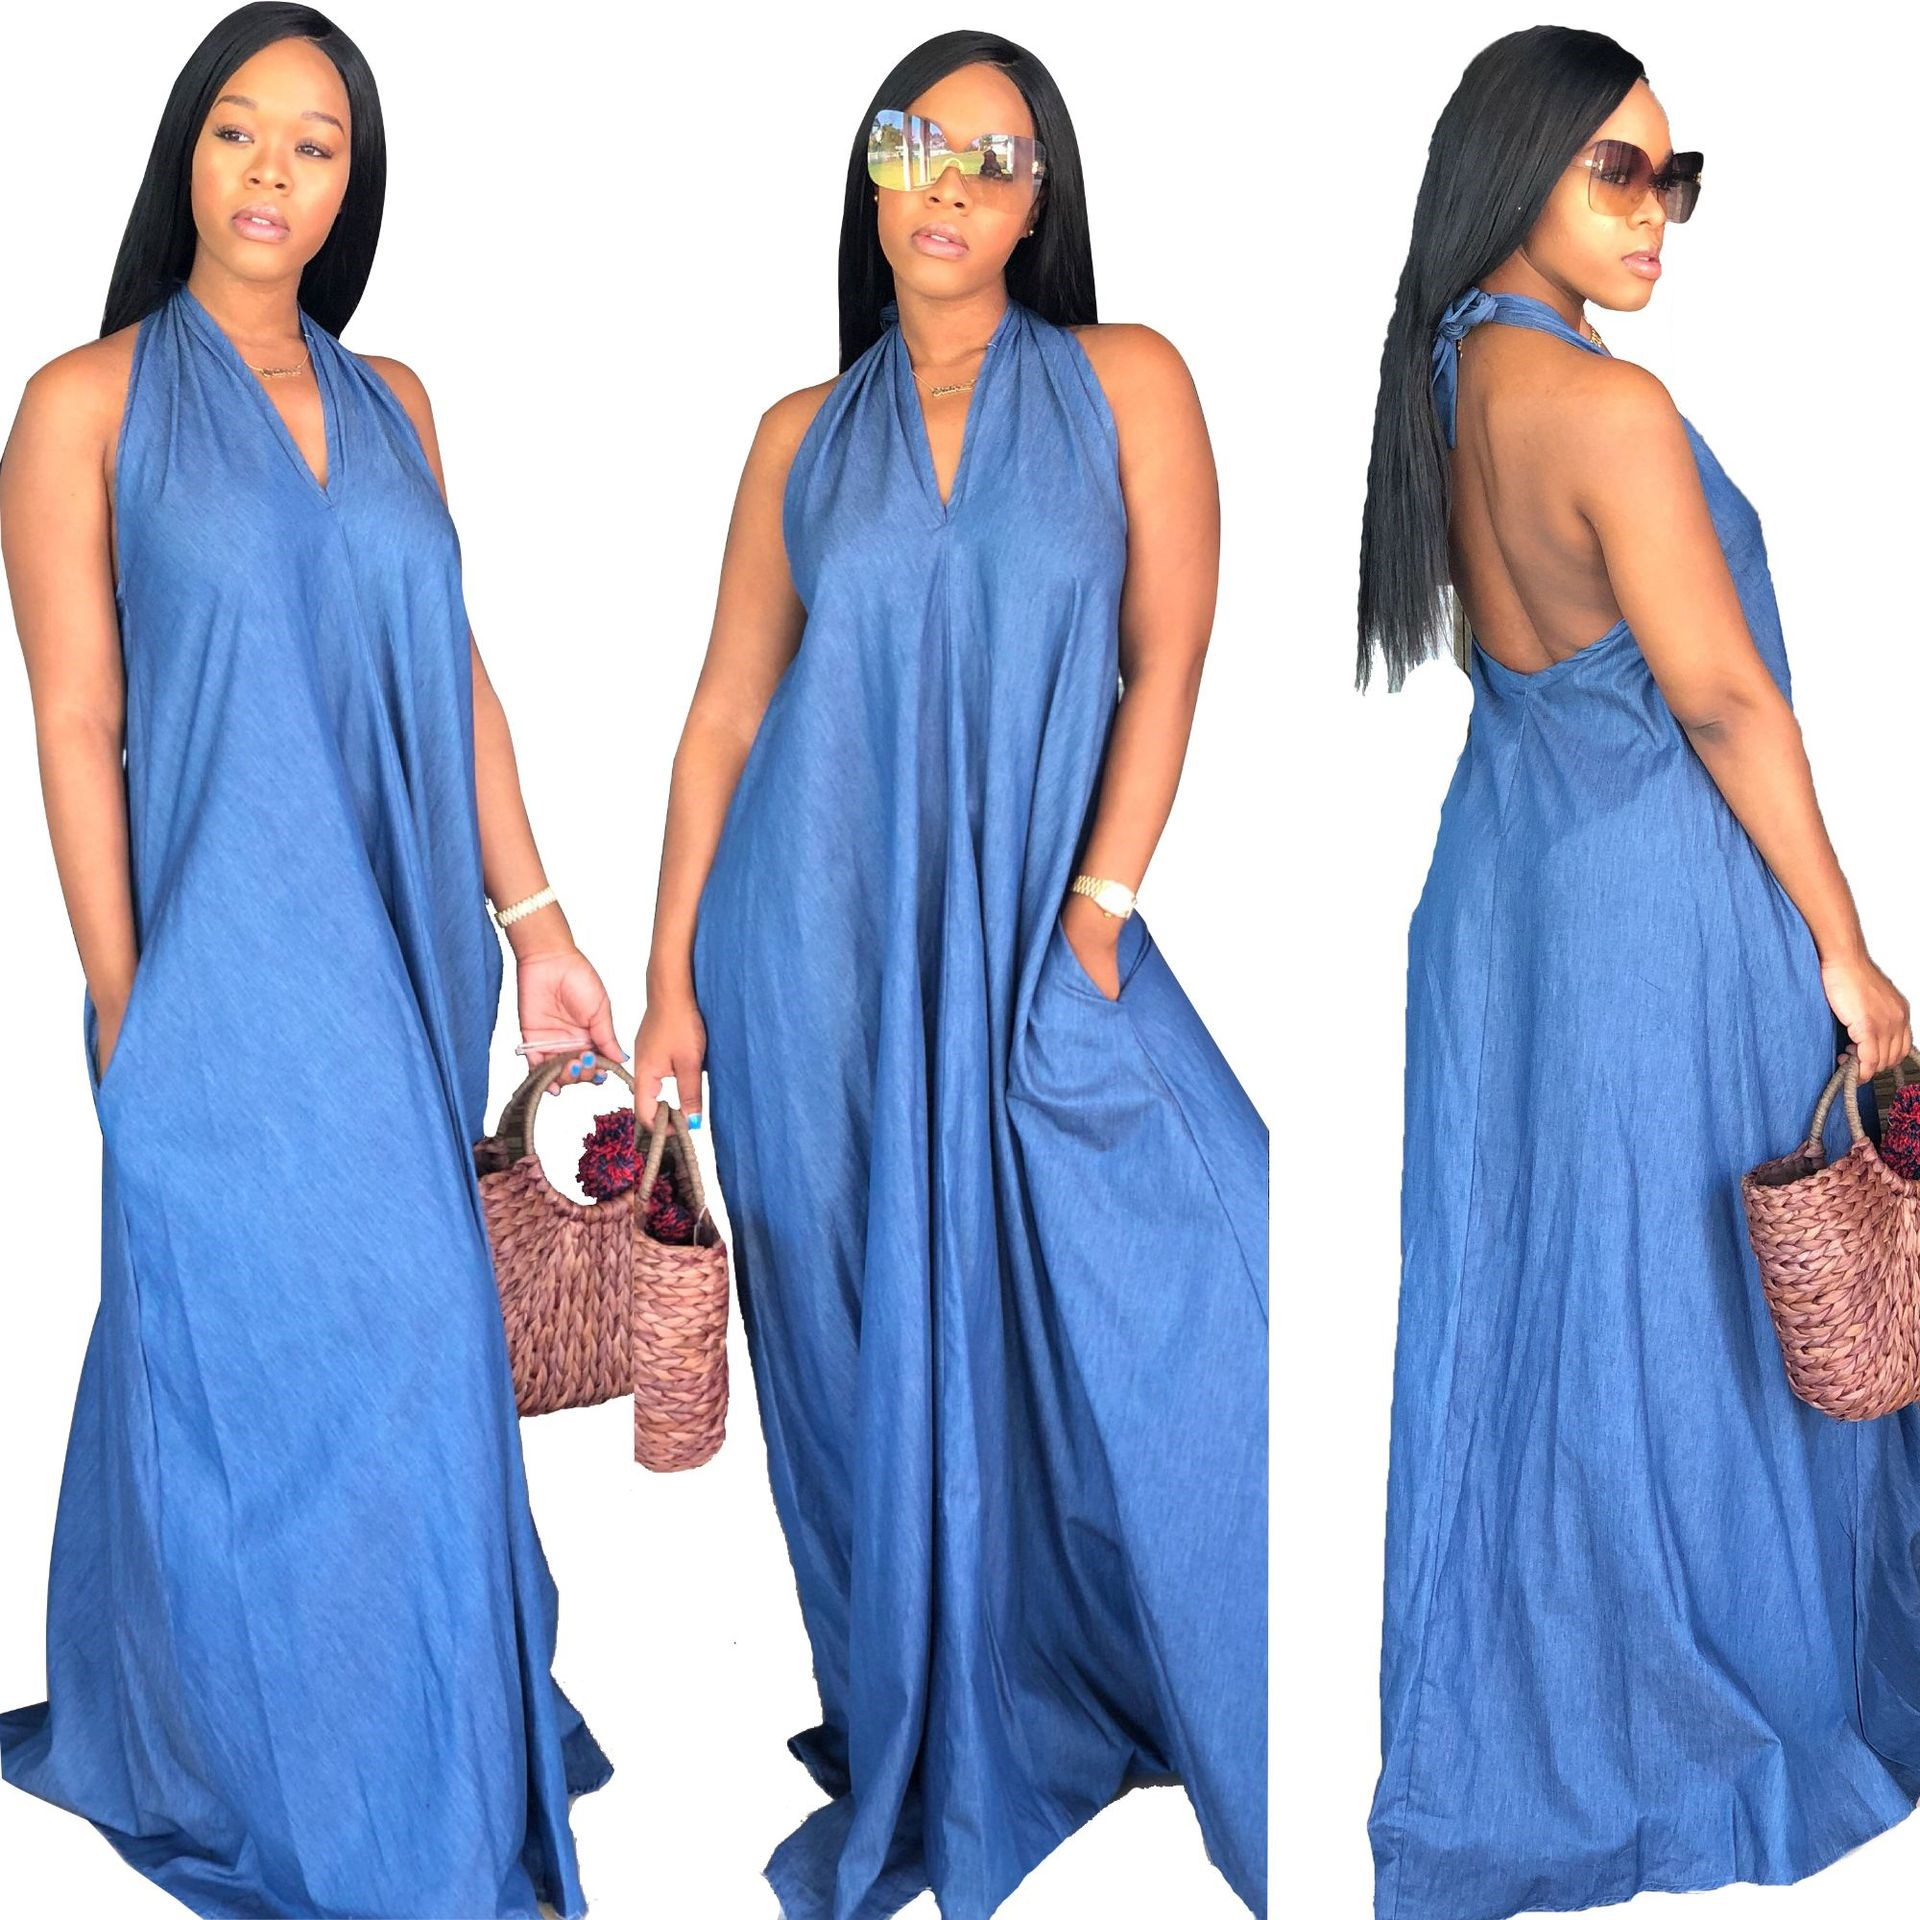 Summer Jeans Denim Halter Dresses Pocket Bodycon Women Fashion Casual Plus Size Dress Vestidos Loose Long Maxi Dress